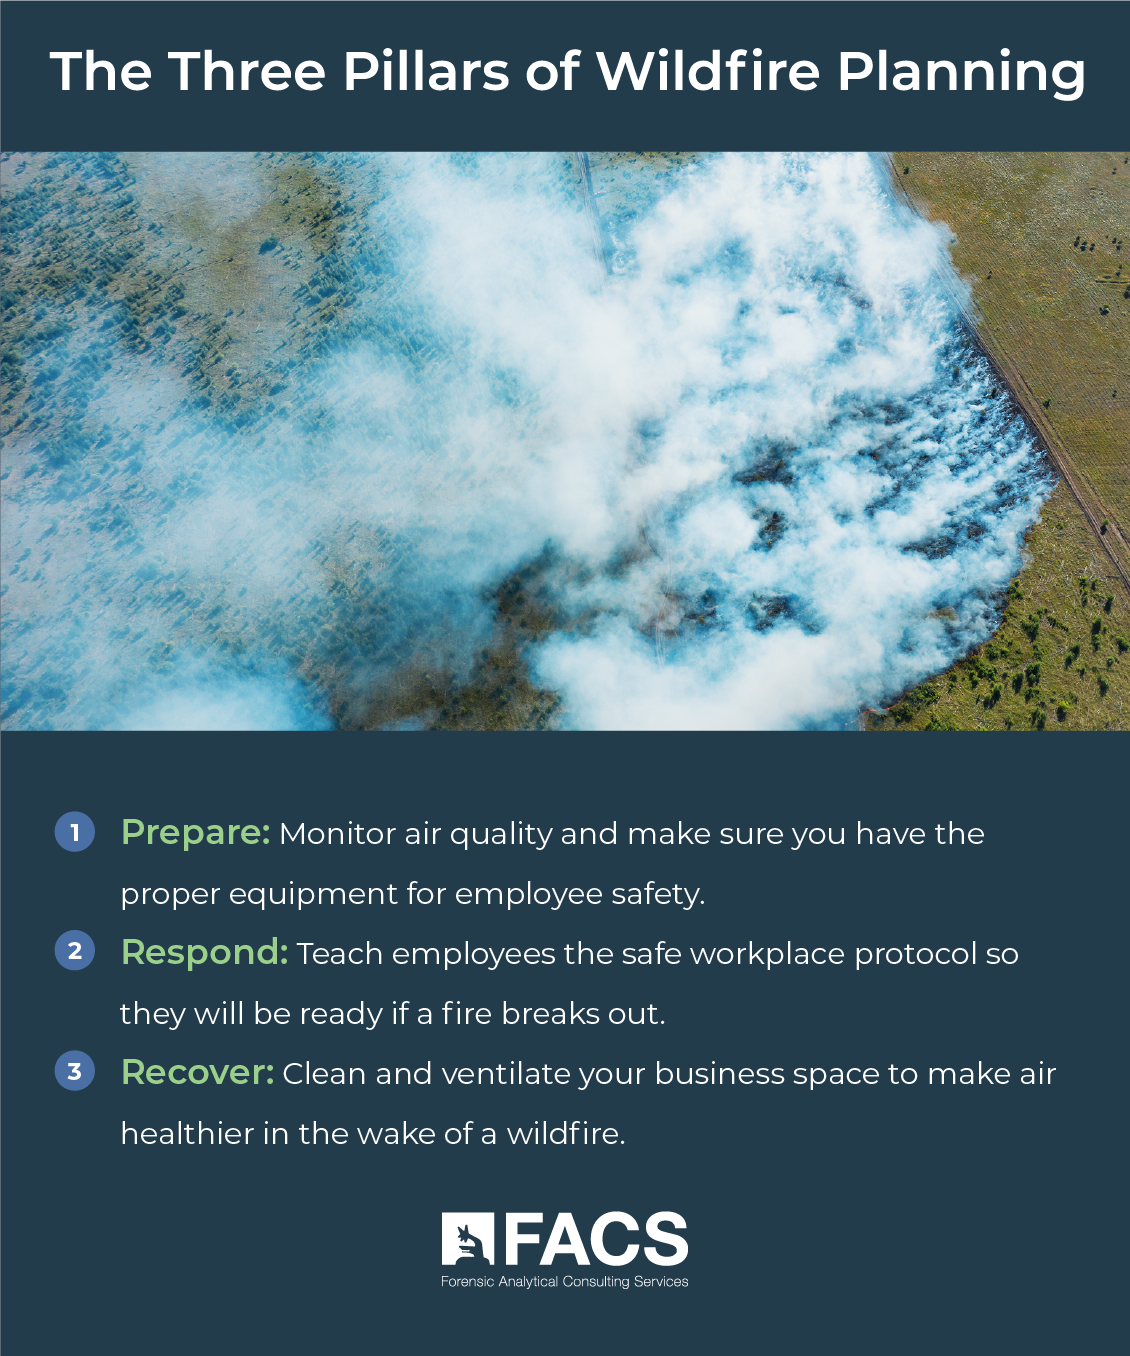 Three Pillars of Wildfire Planning